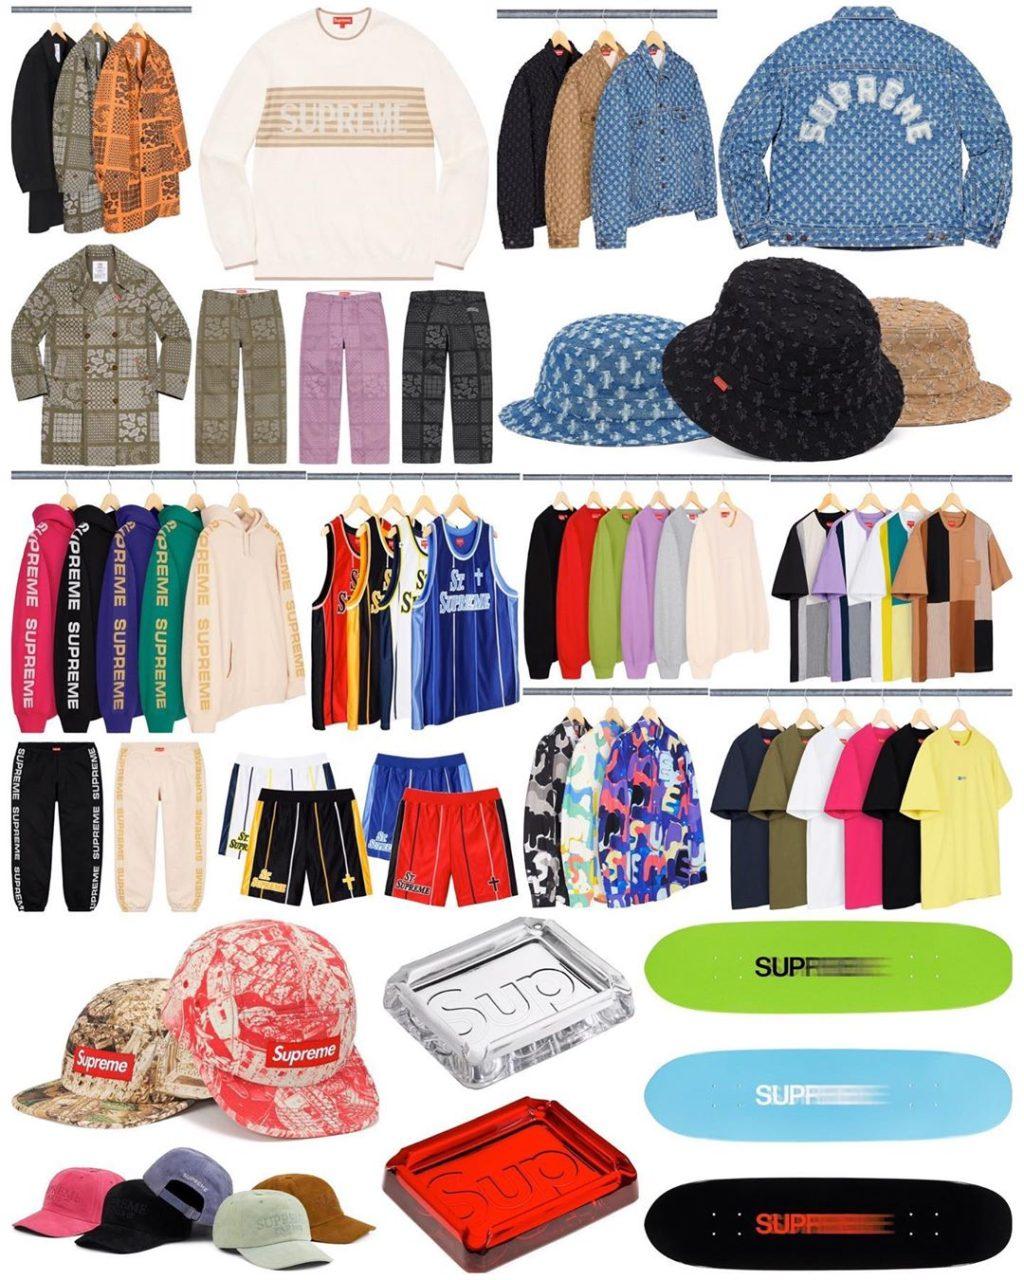 supreme-online-store-202000501-week10-release-items